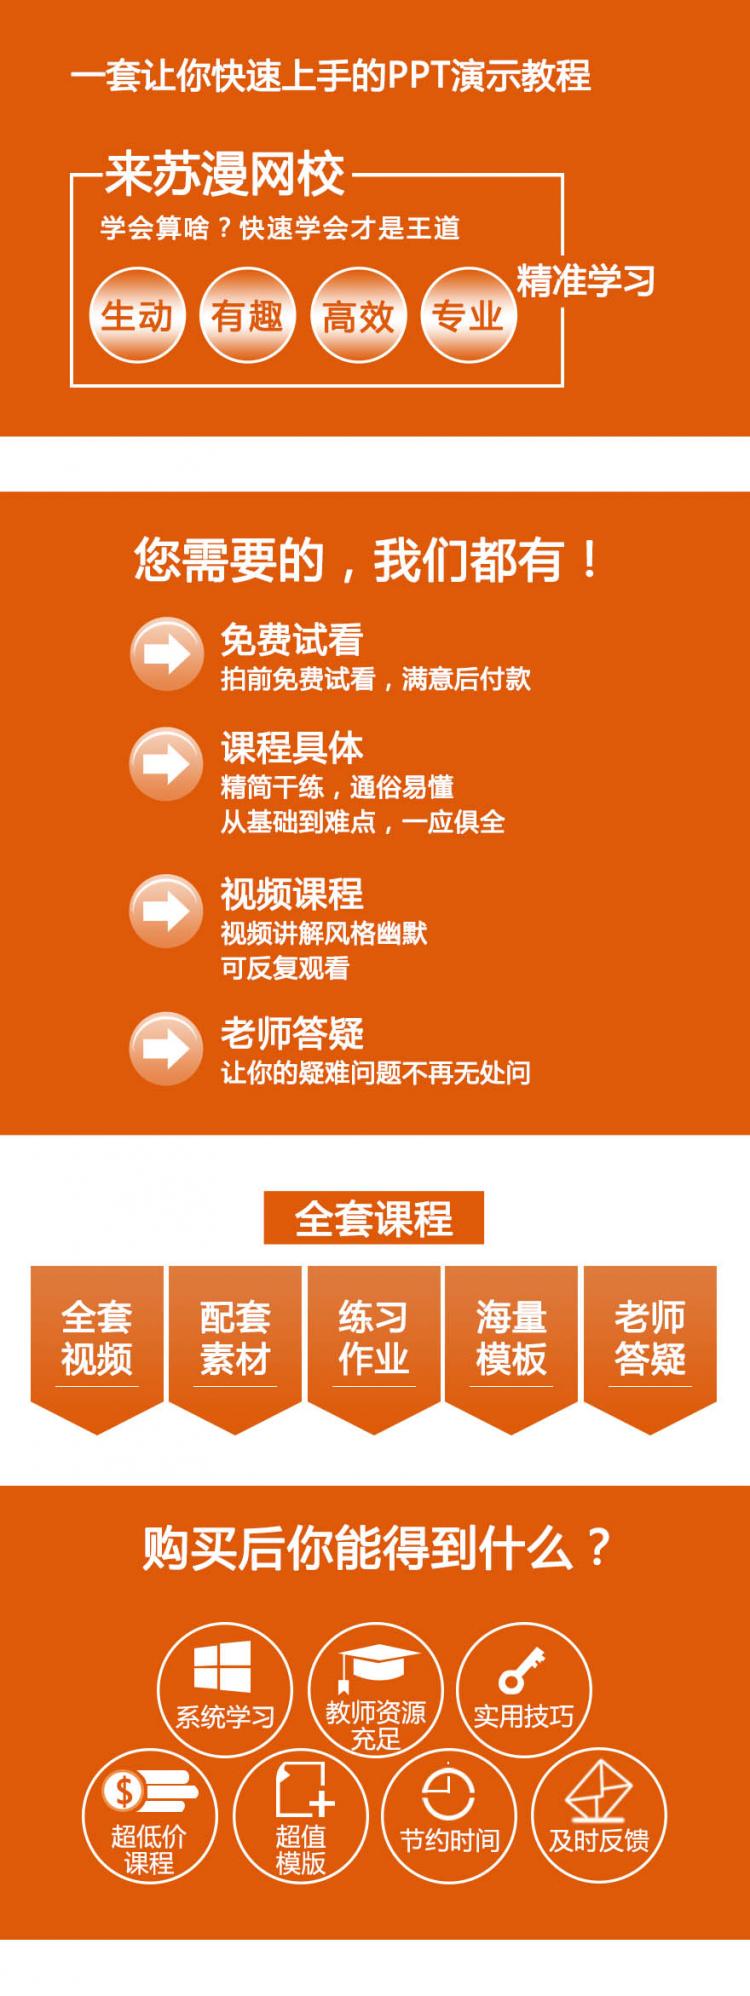 5PPT演示课程详情页.jpg